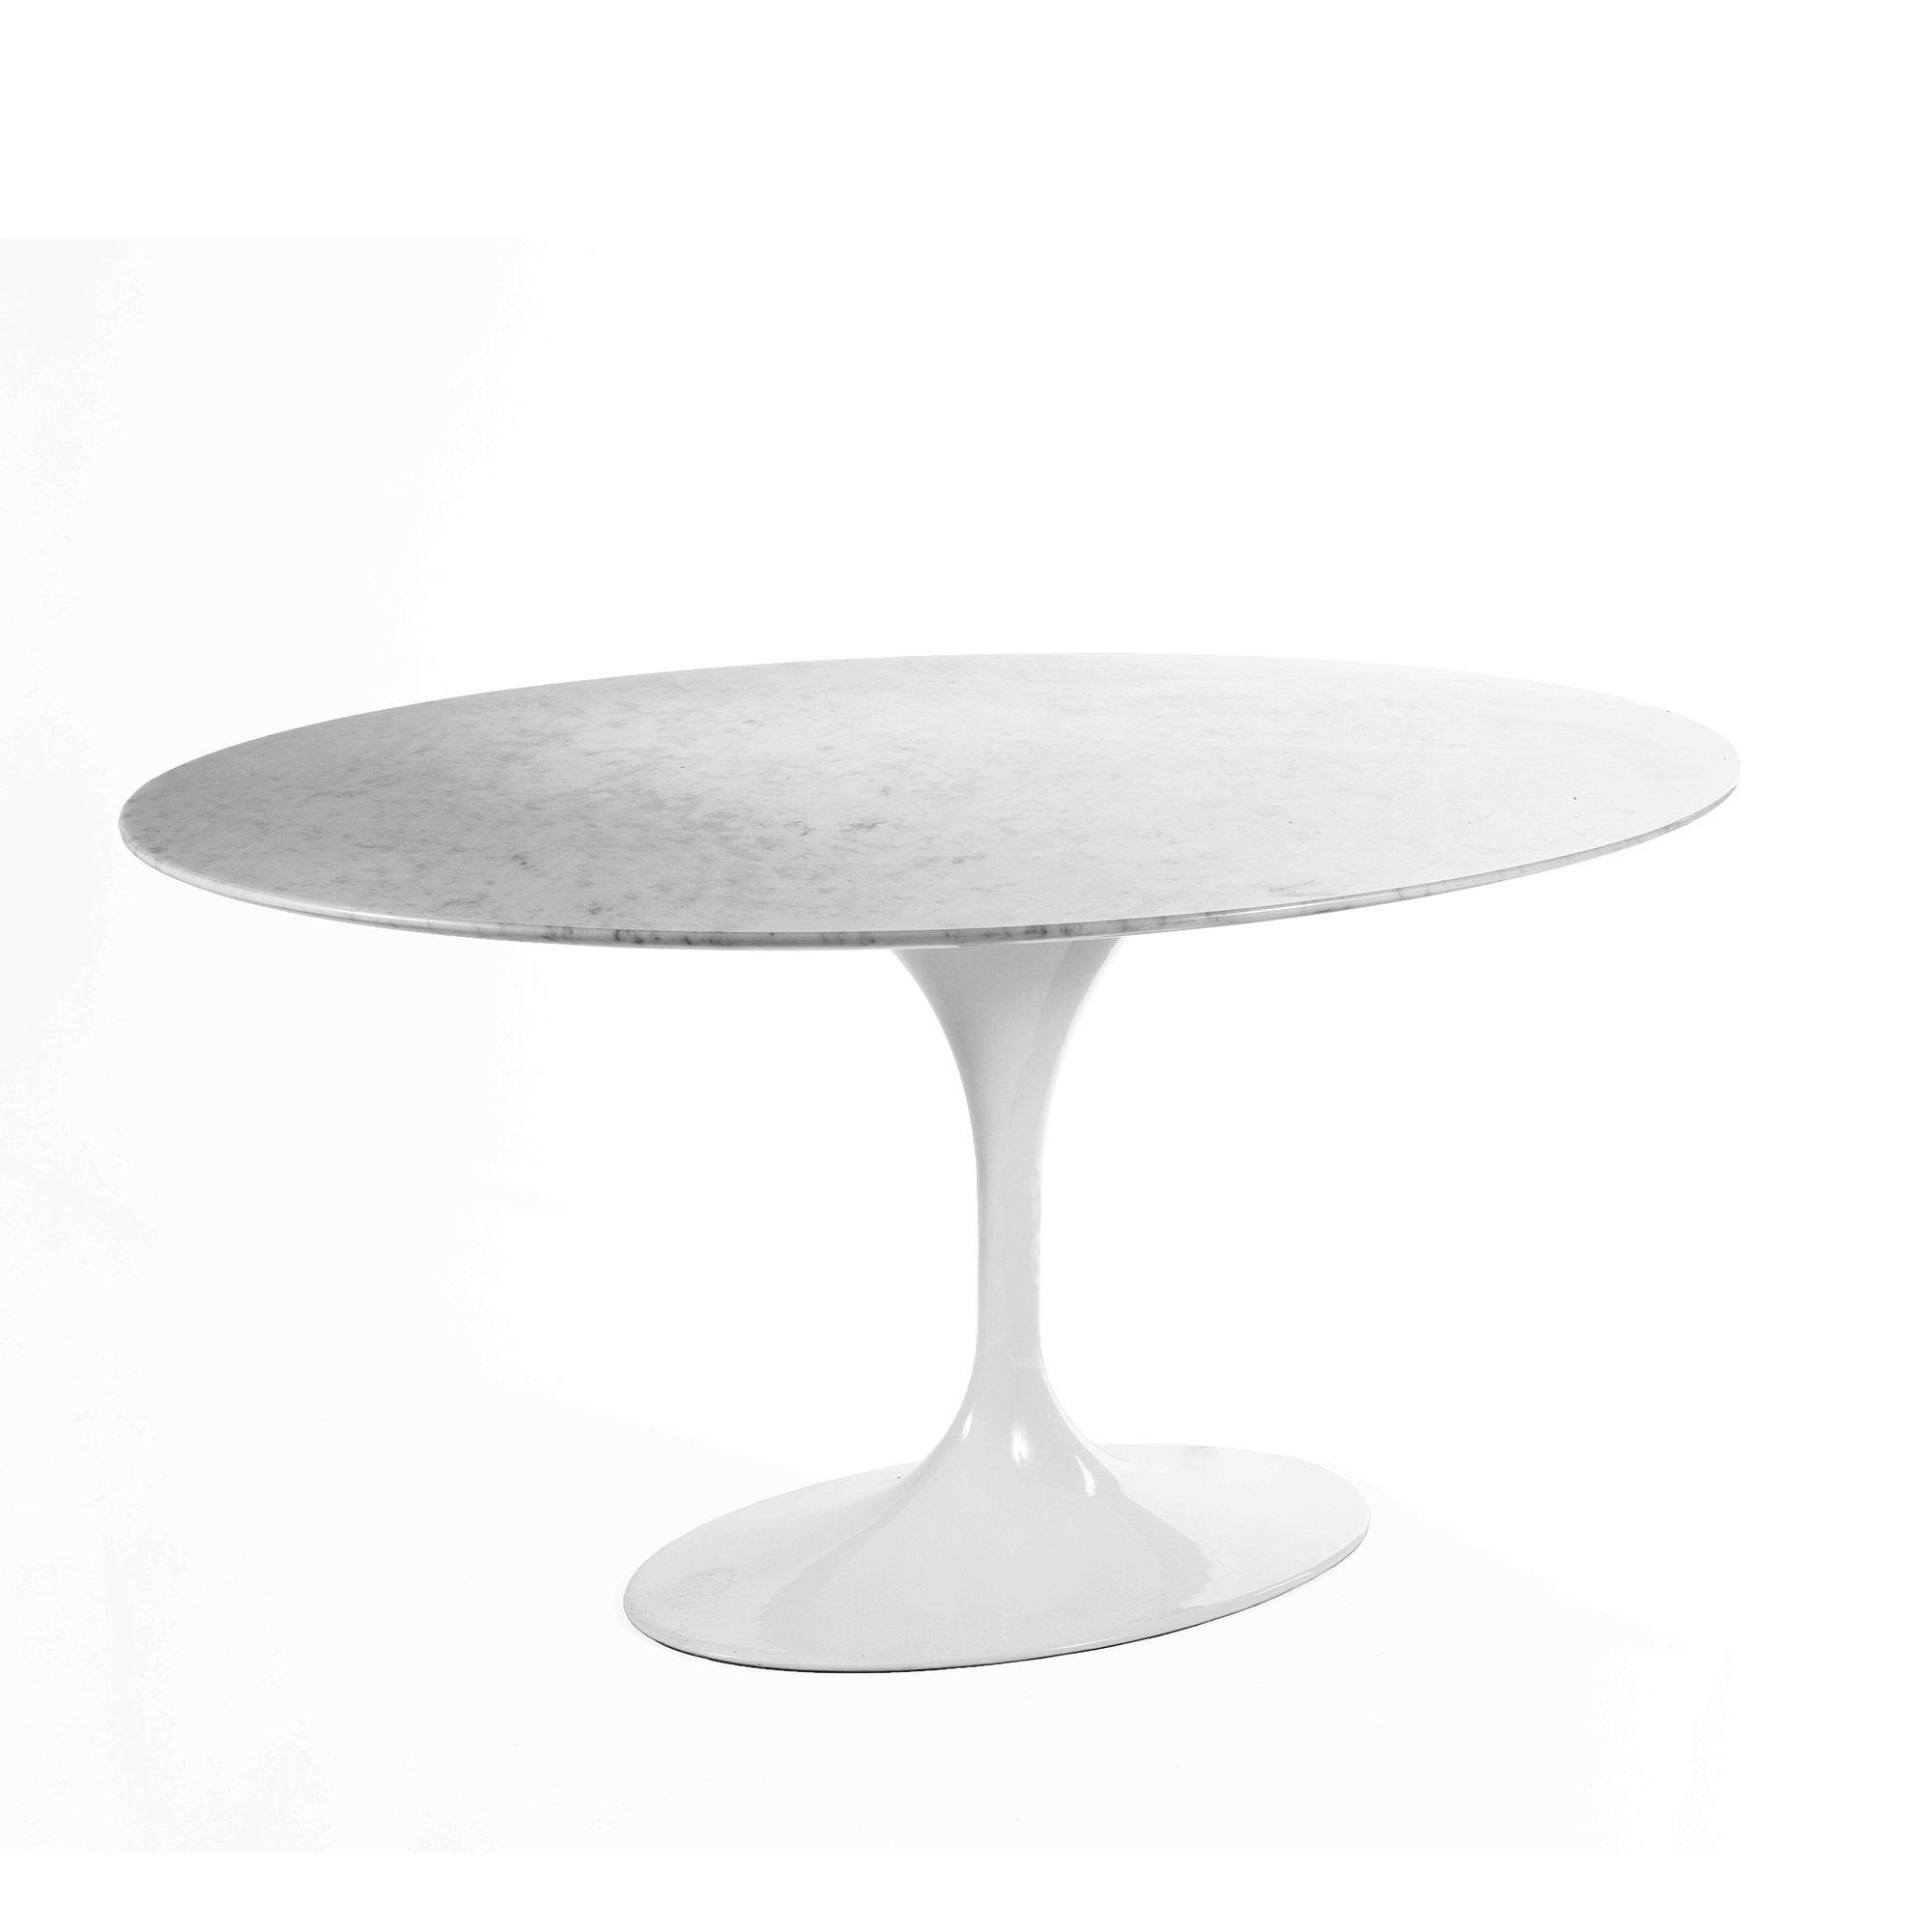 Carrara Marble Tulip Dining Table 60 X 42 Oval Tulip Dining Table Modern Dining Room Tables Dining Table